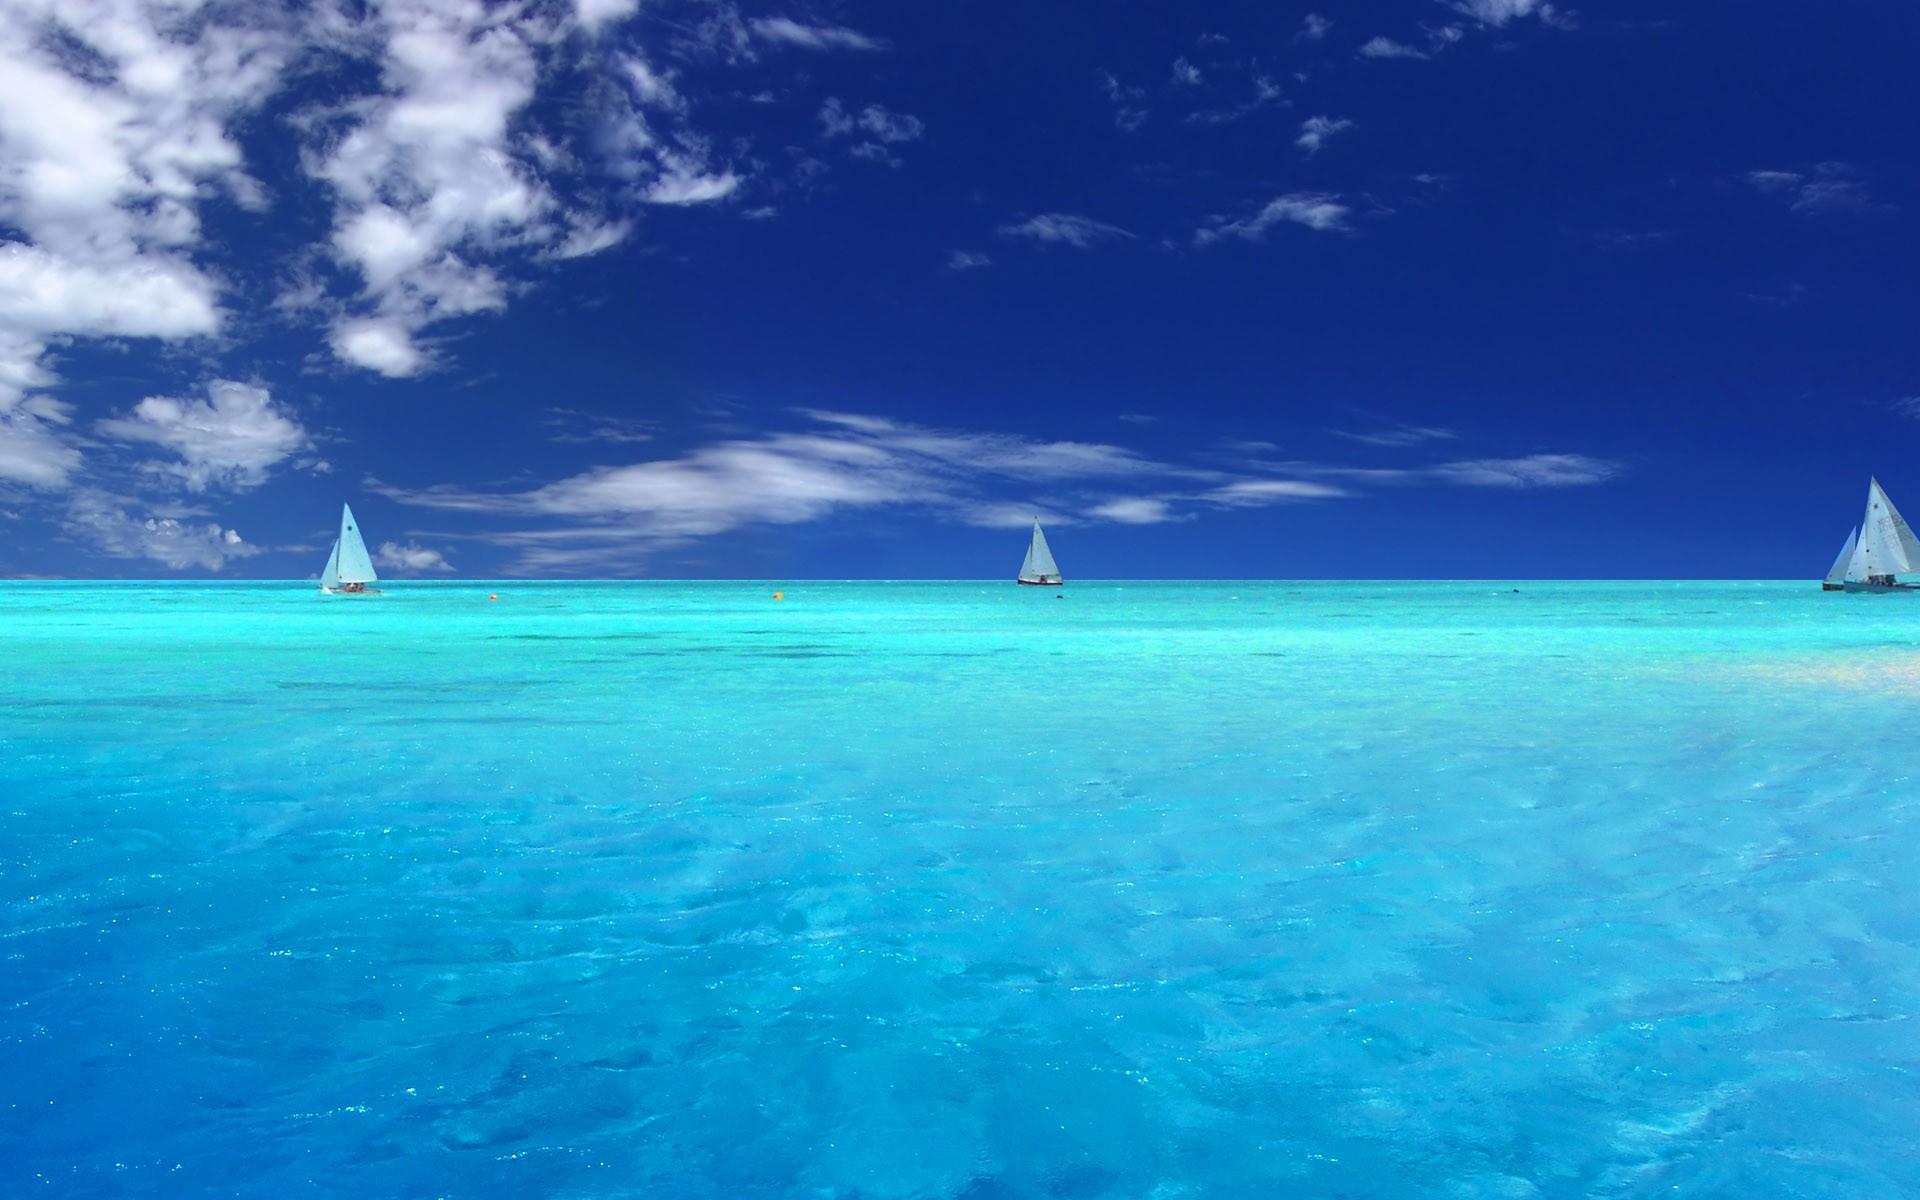 the beautiful seaside scenery - photo #40